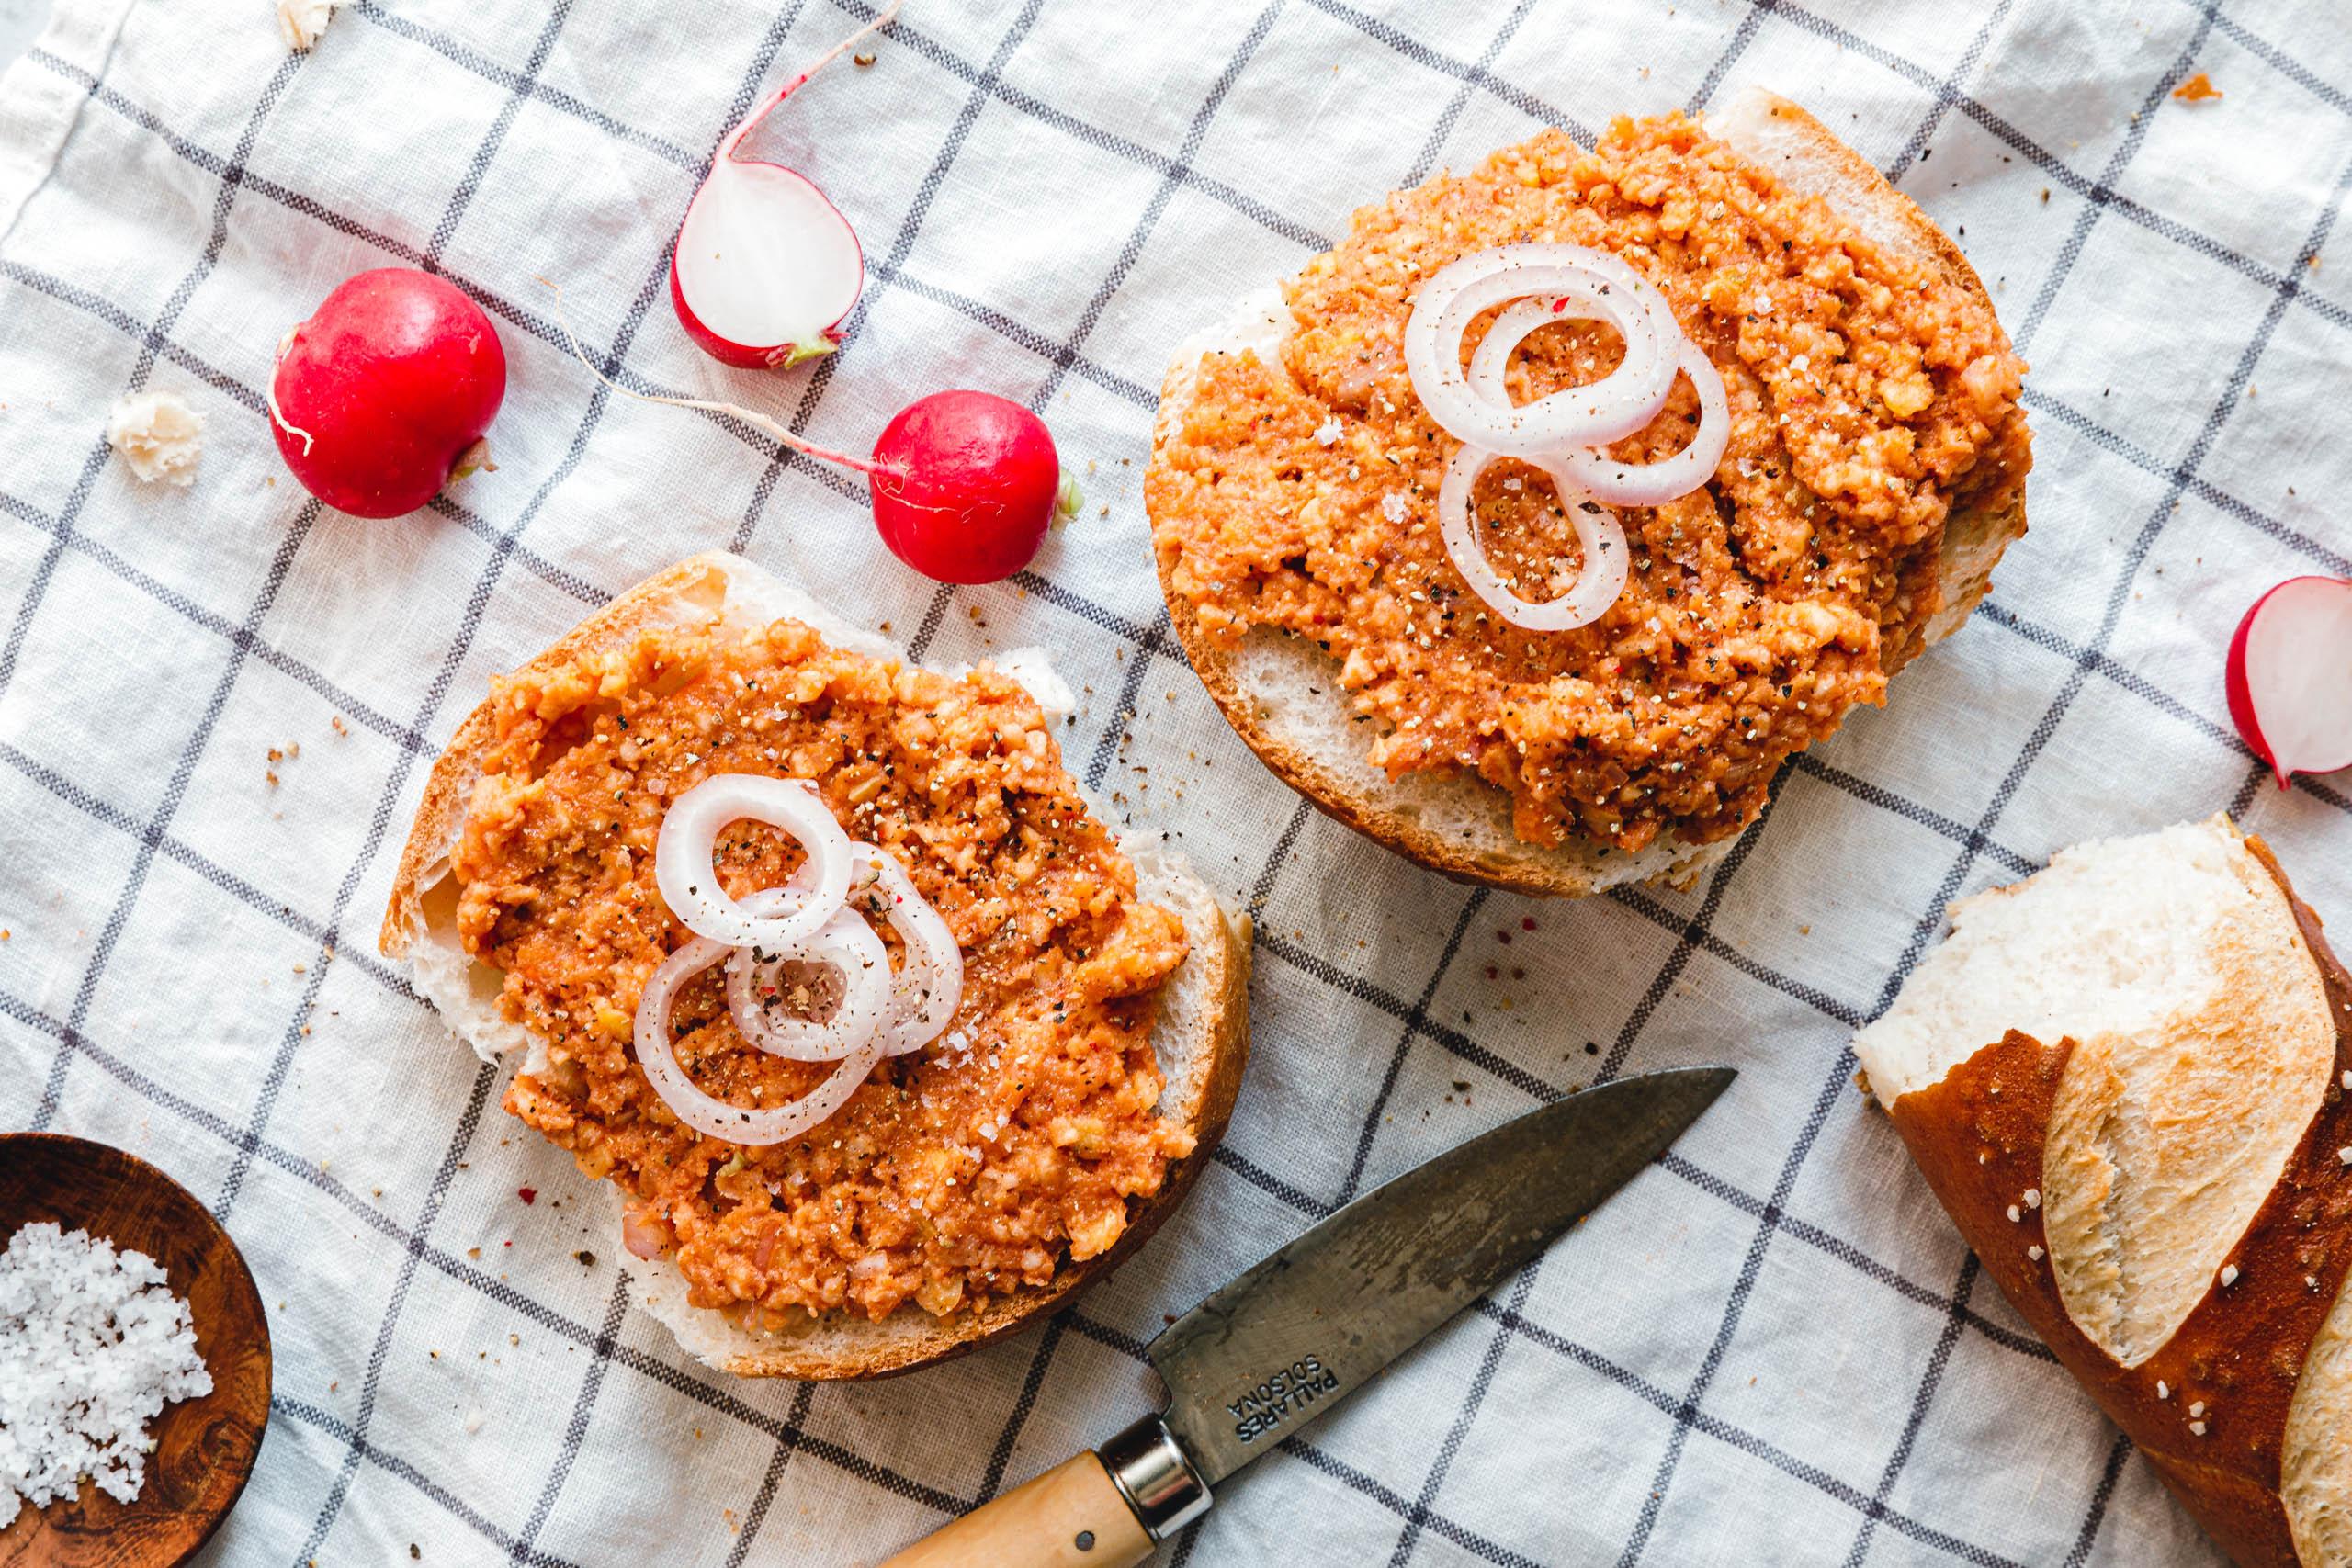 Eat this! Veganes Mett aus Reiswaffeln